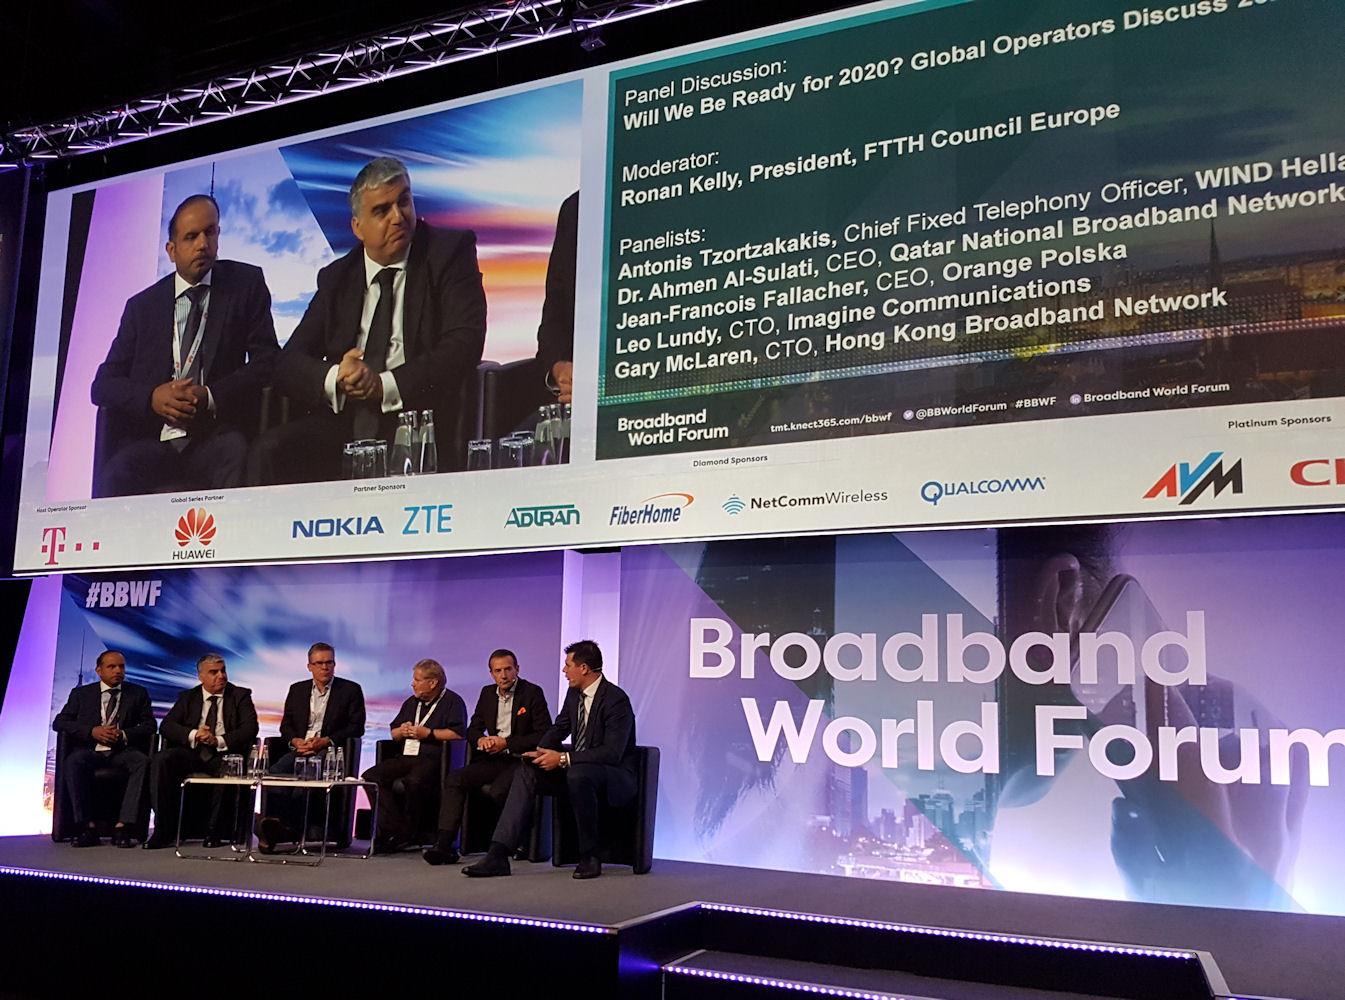 BBWF 2020 panel